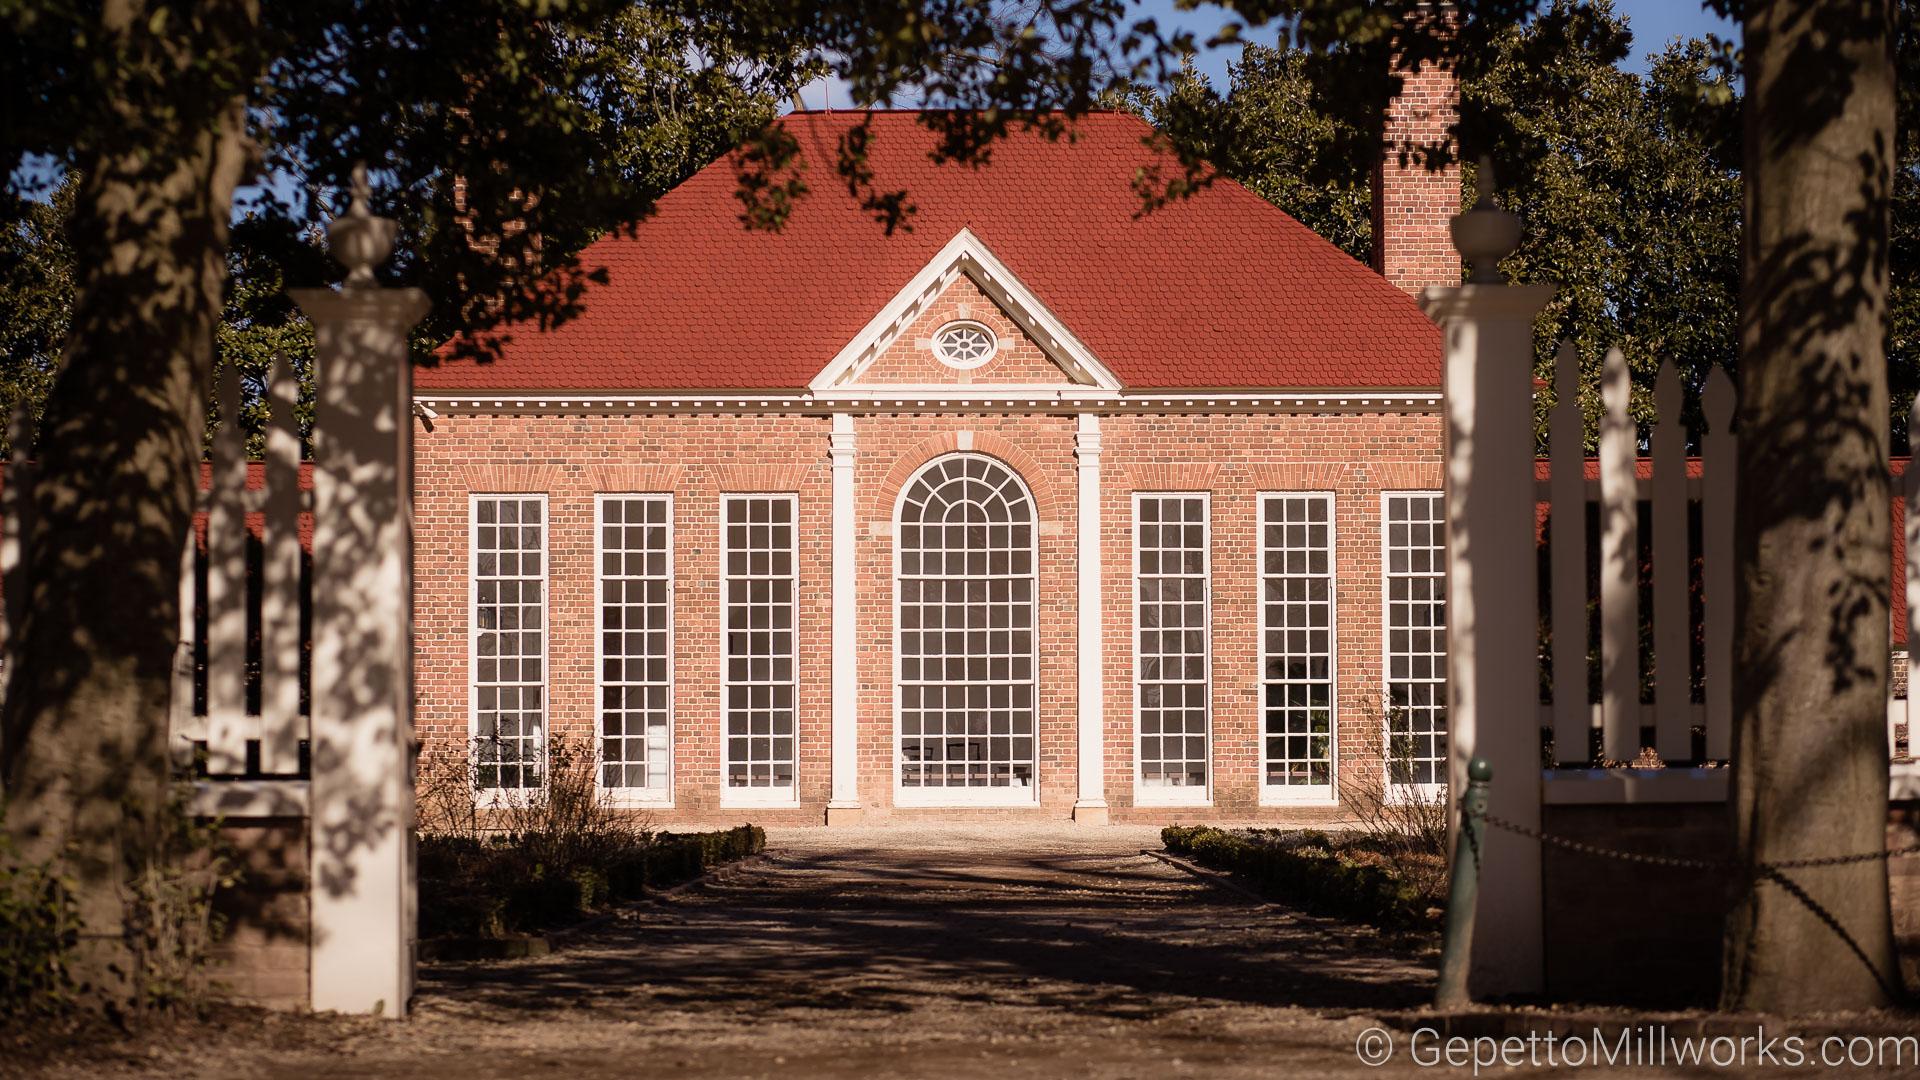 Mount Vernon Historic Site Building Materials